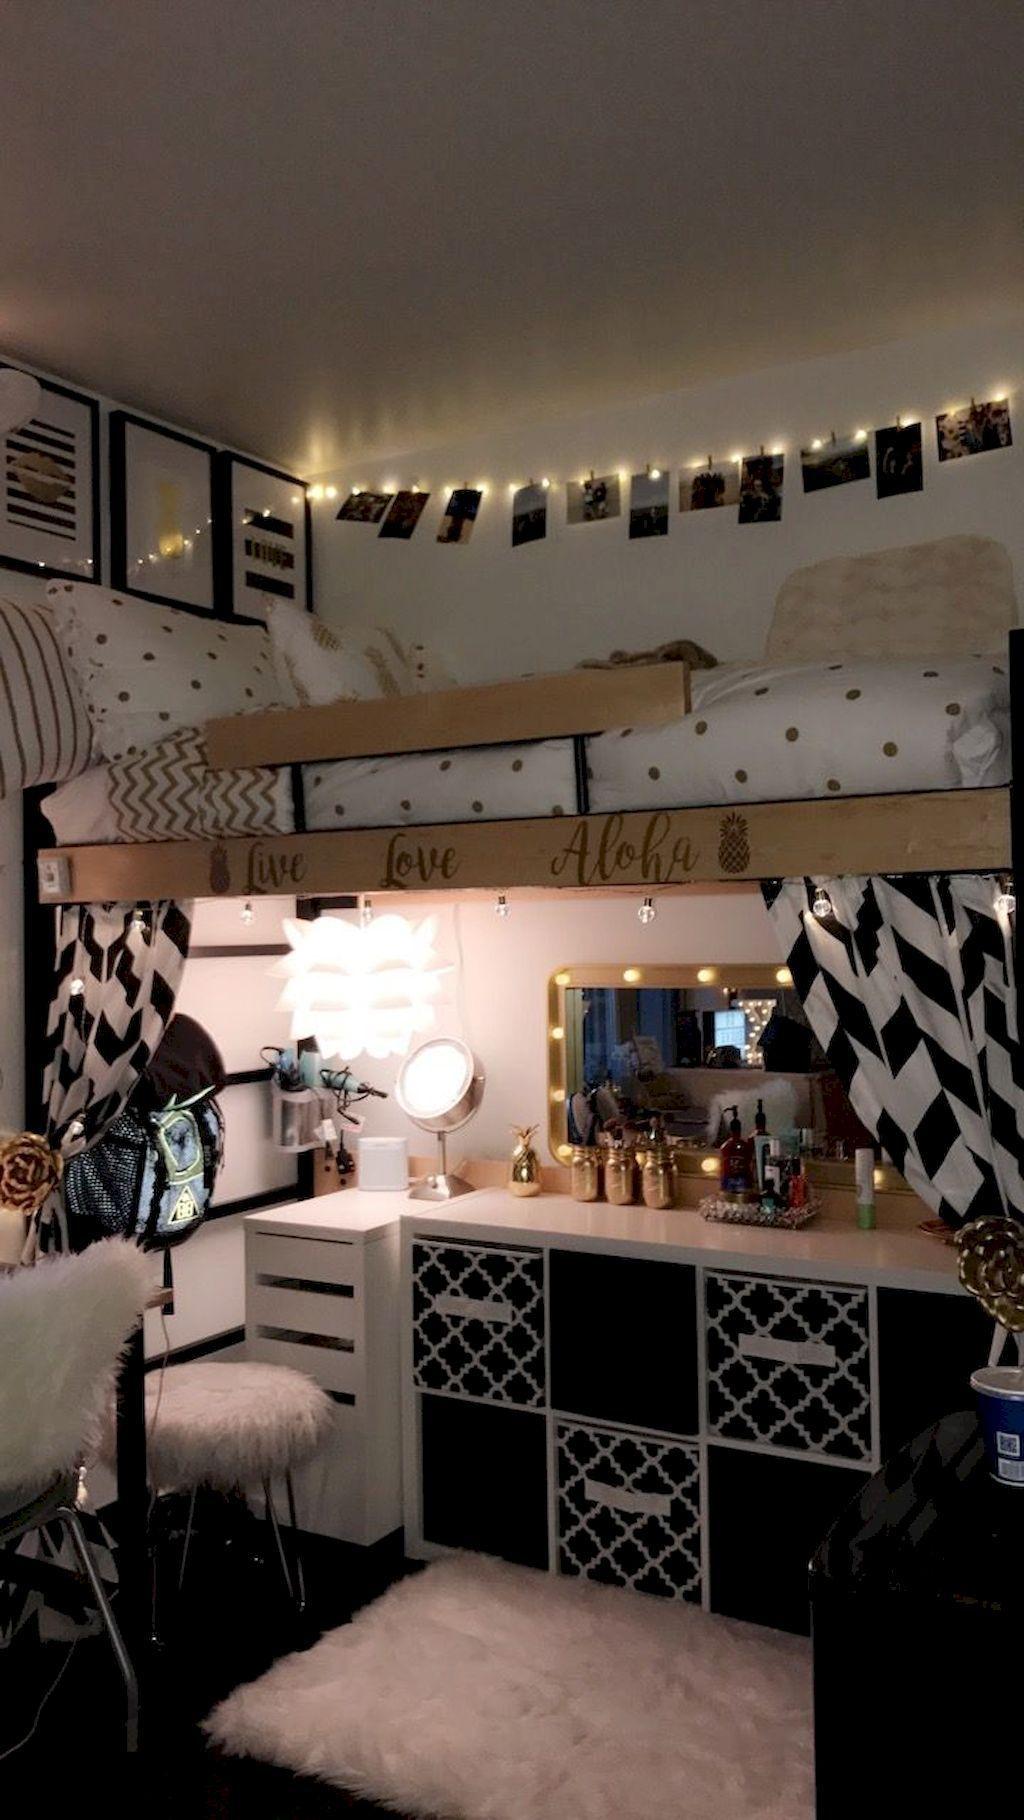 Photo of Awesome 75 Cute Dorm Room Decorating Ideas on A Budget homespecially.com…